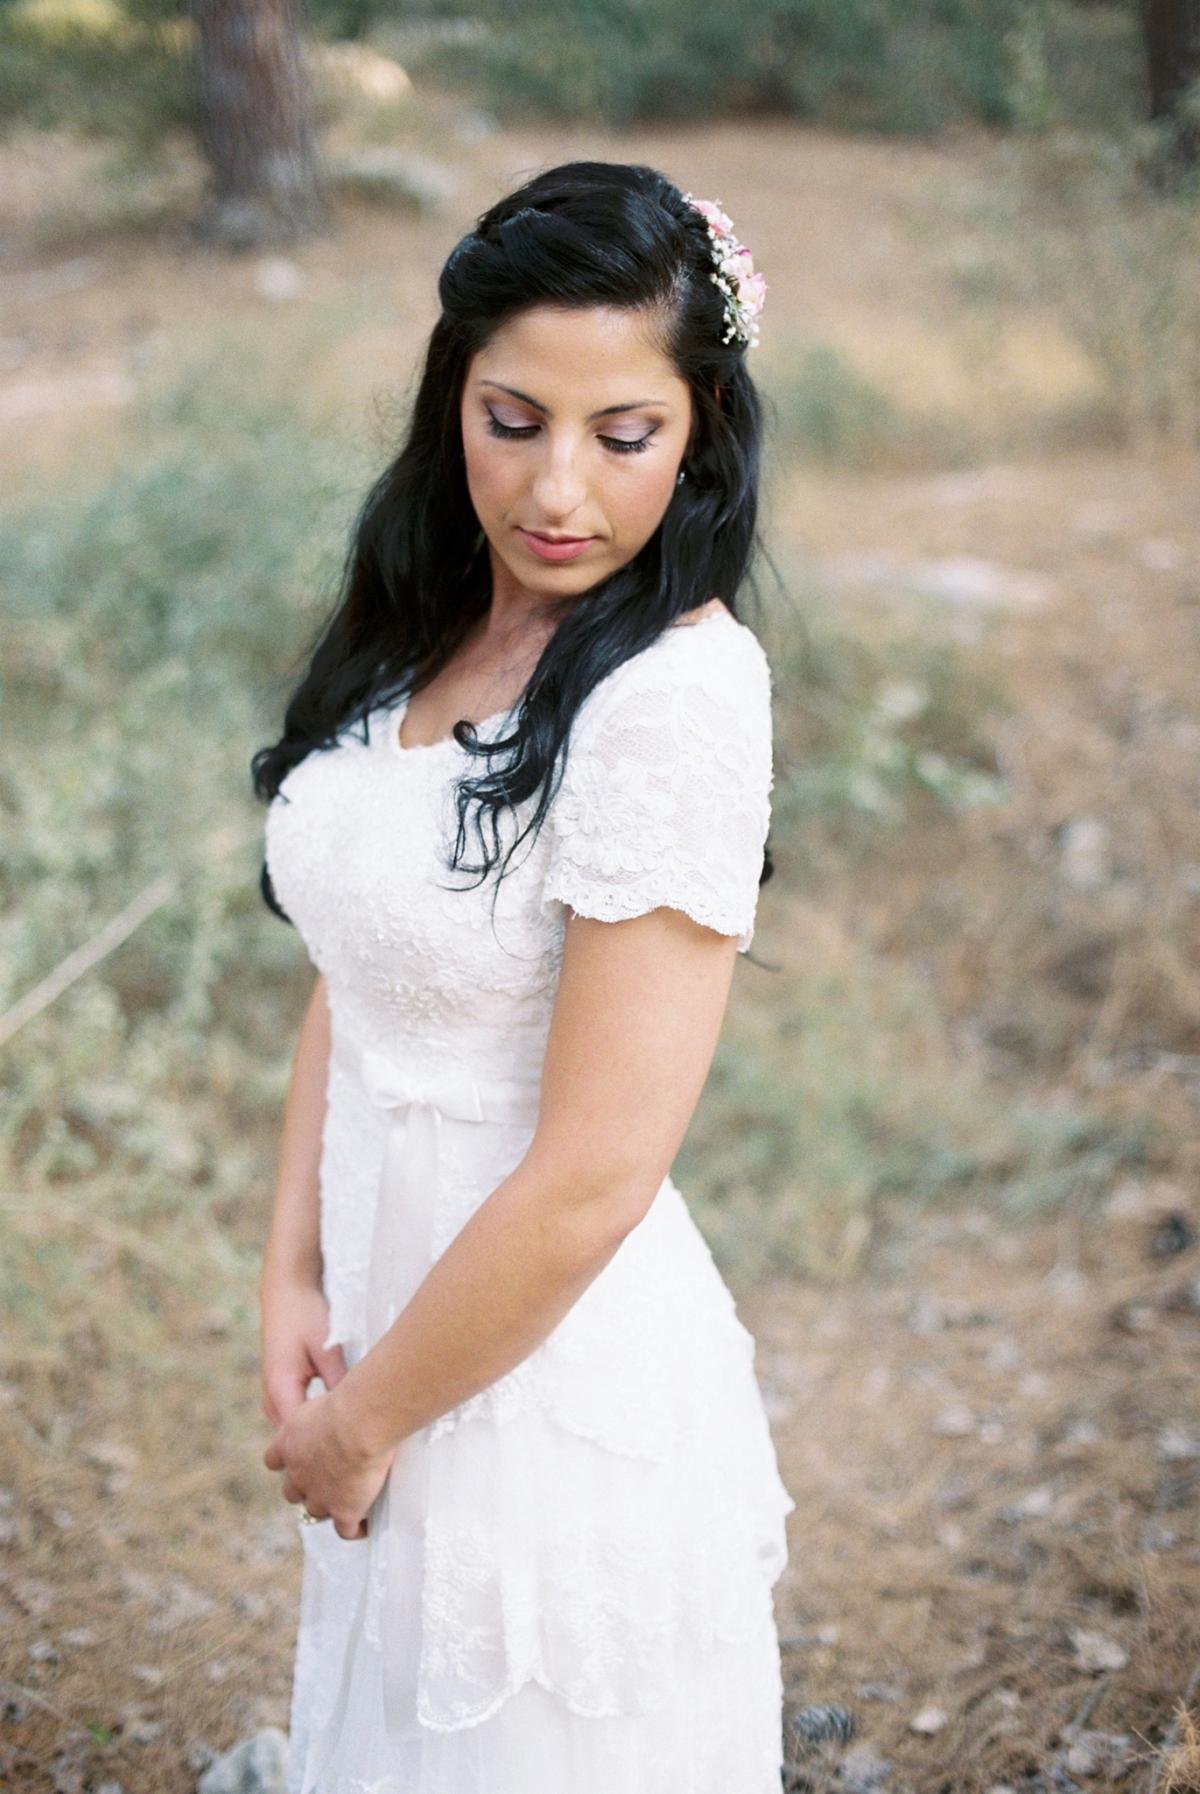 neot-kedumim-wedding-israel-shira-and-eilam-sigala-photography_0020